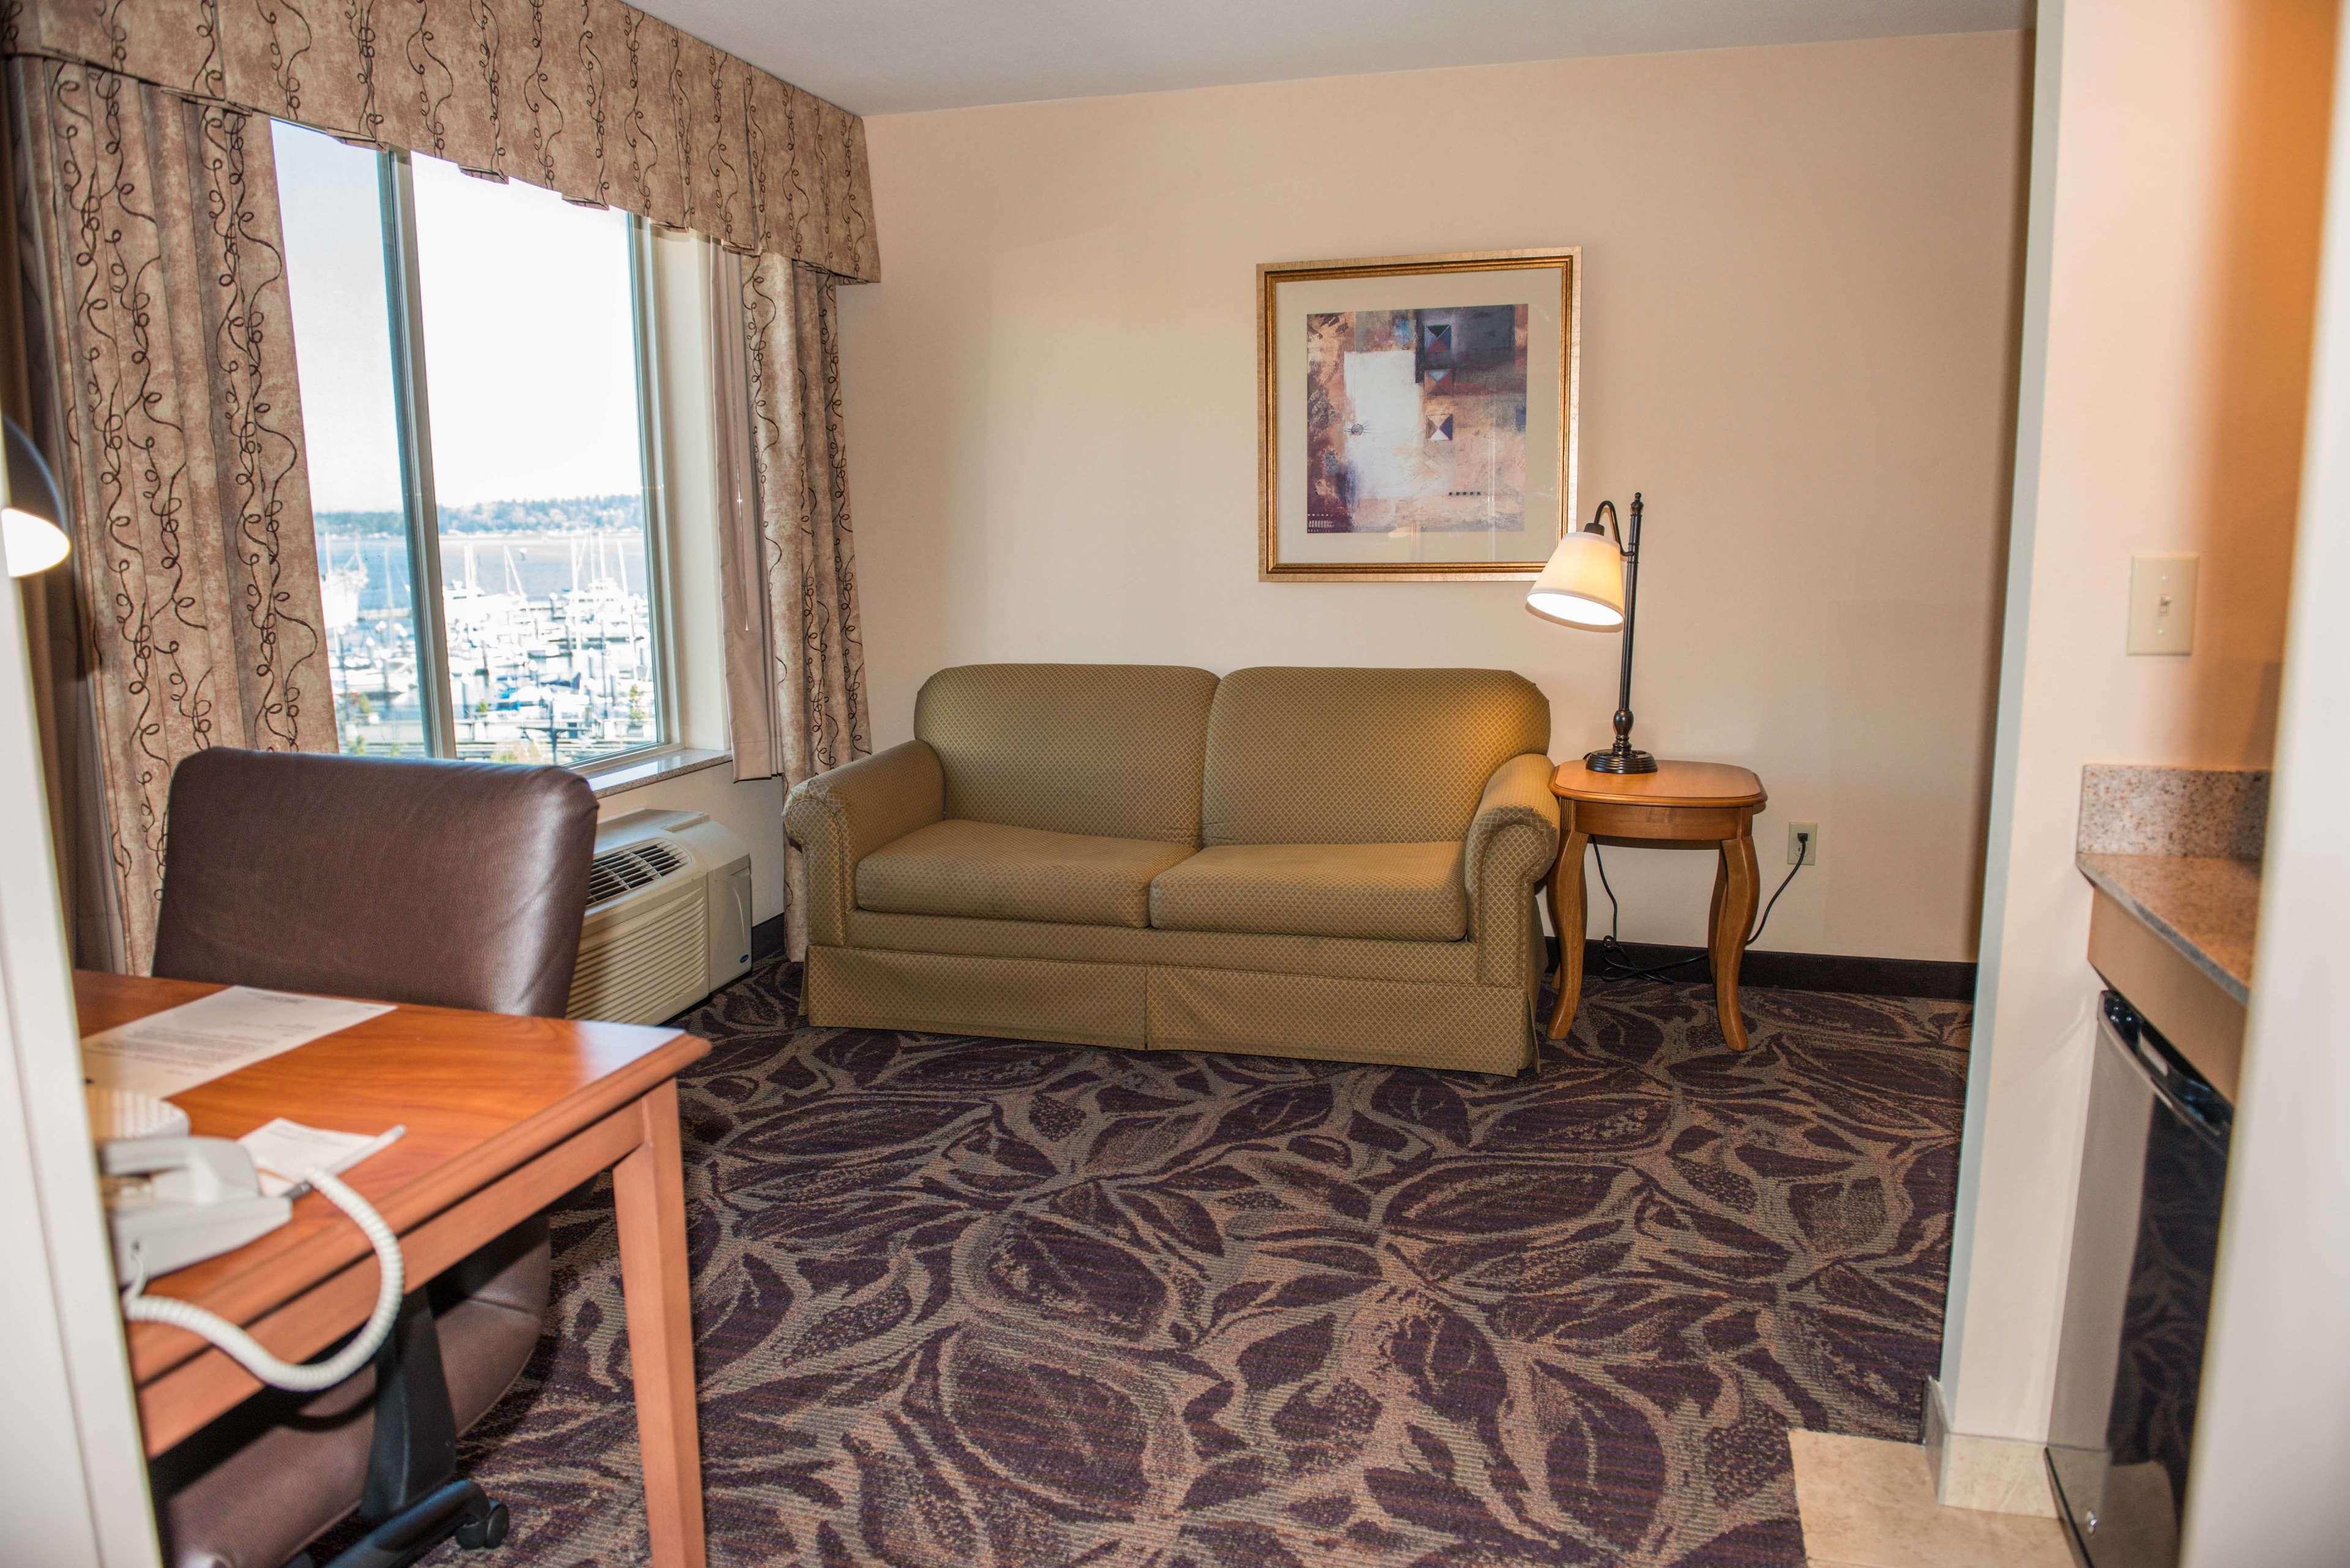 Hampton Inn & Suites Bremerton image 42